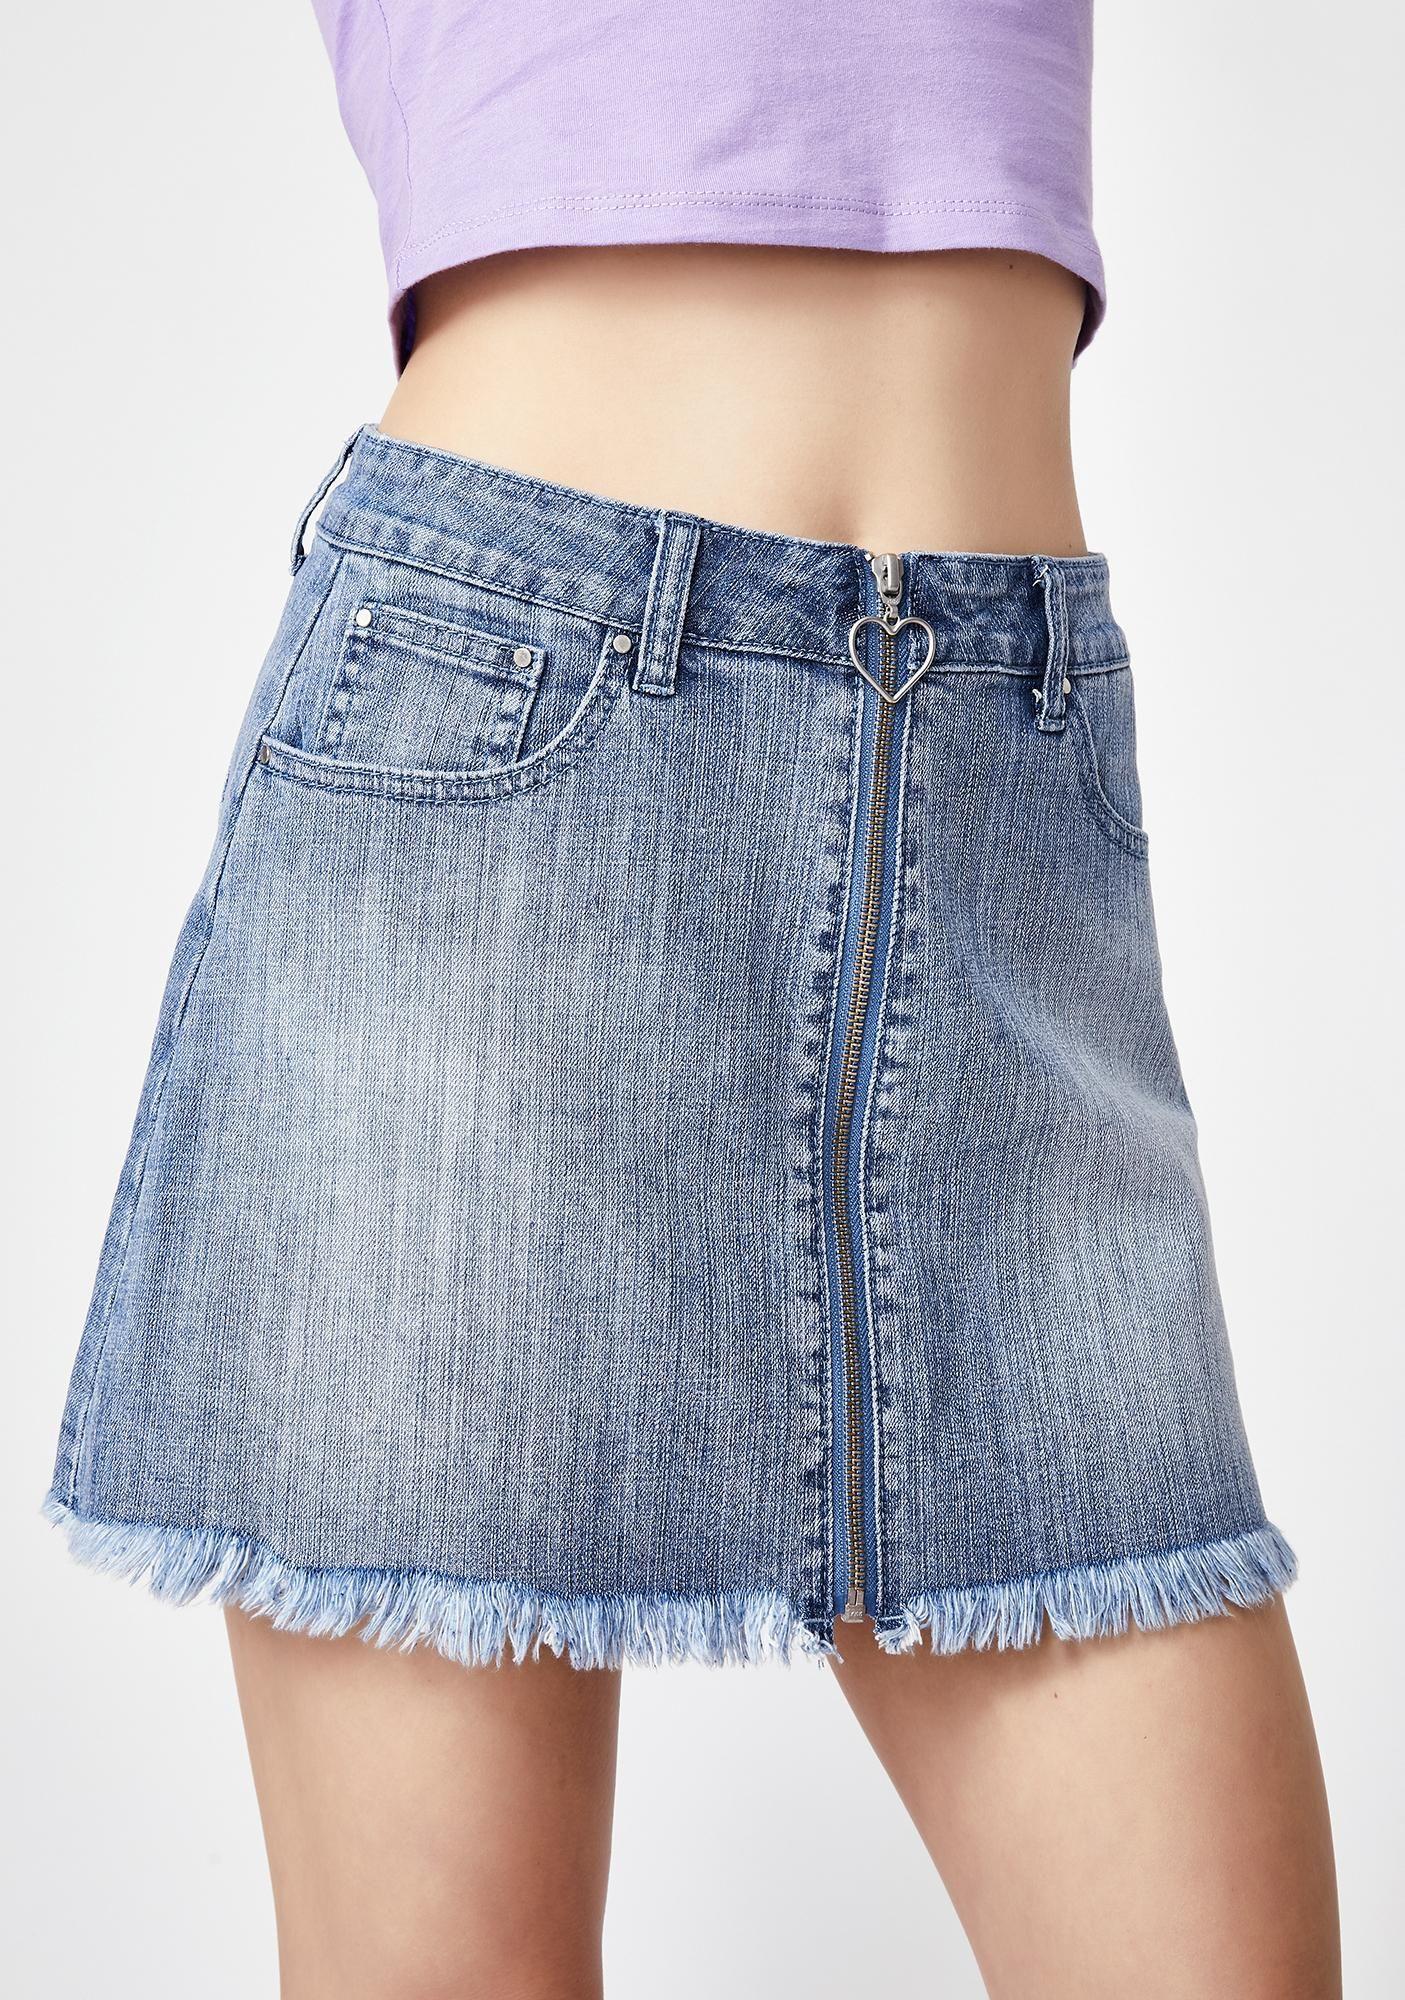 2294c4993 Sugar Thrillz Rich In Love Denim Skirt | Dolls Kill #dollskill  #sugarthrillz #spoiled #2000 #y2k #princess #demin #skirt